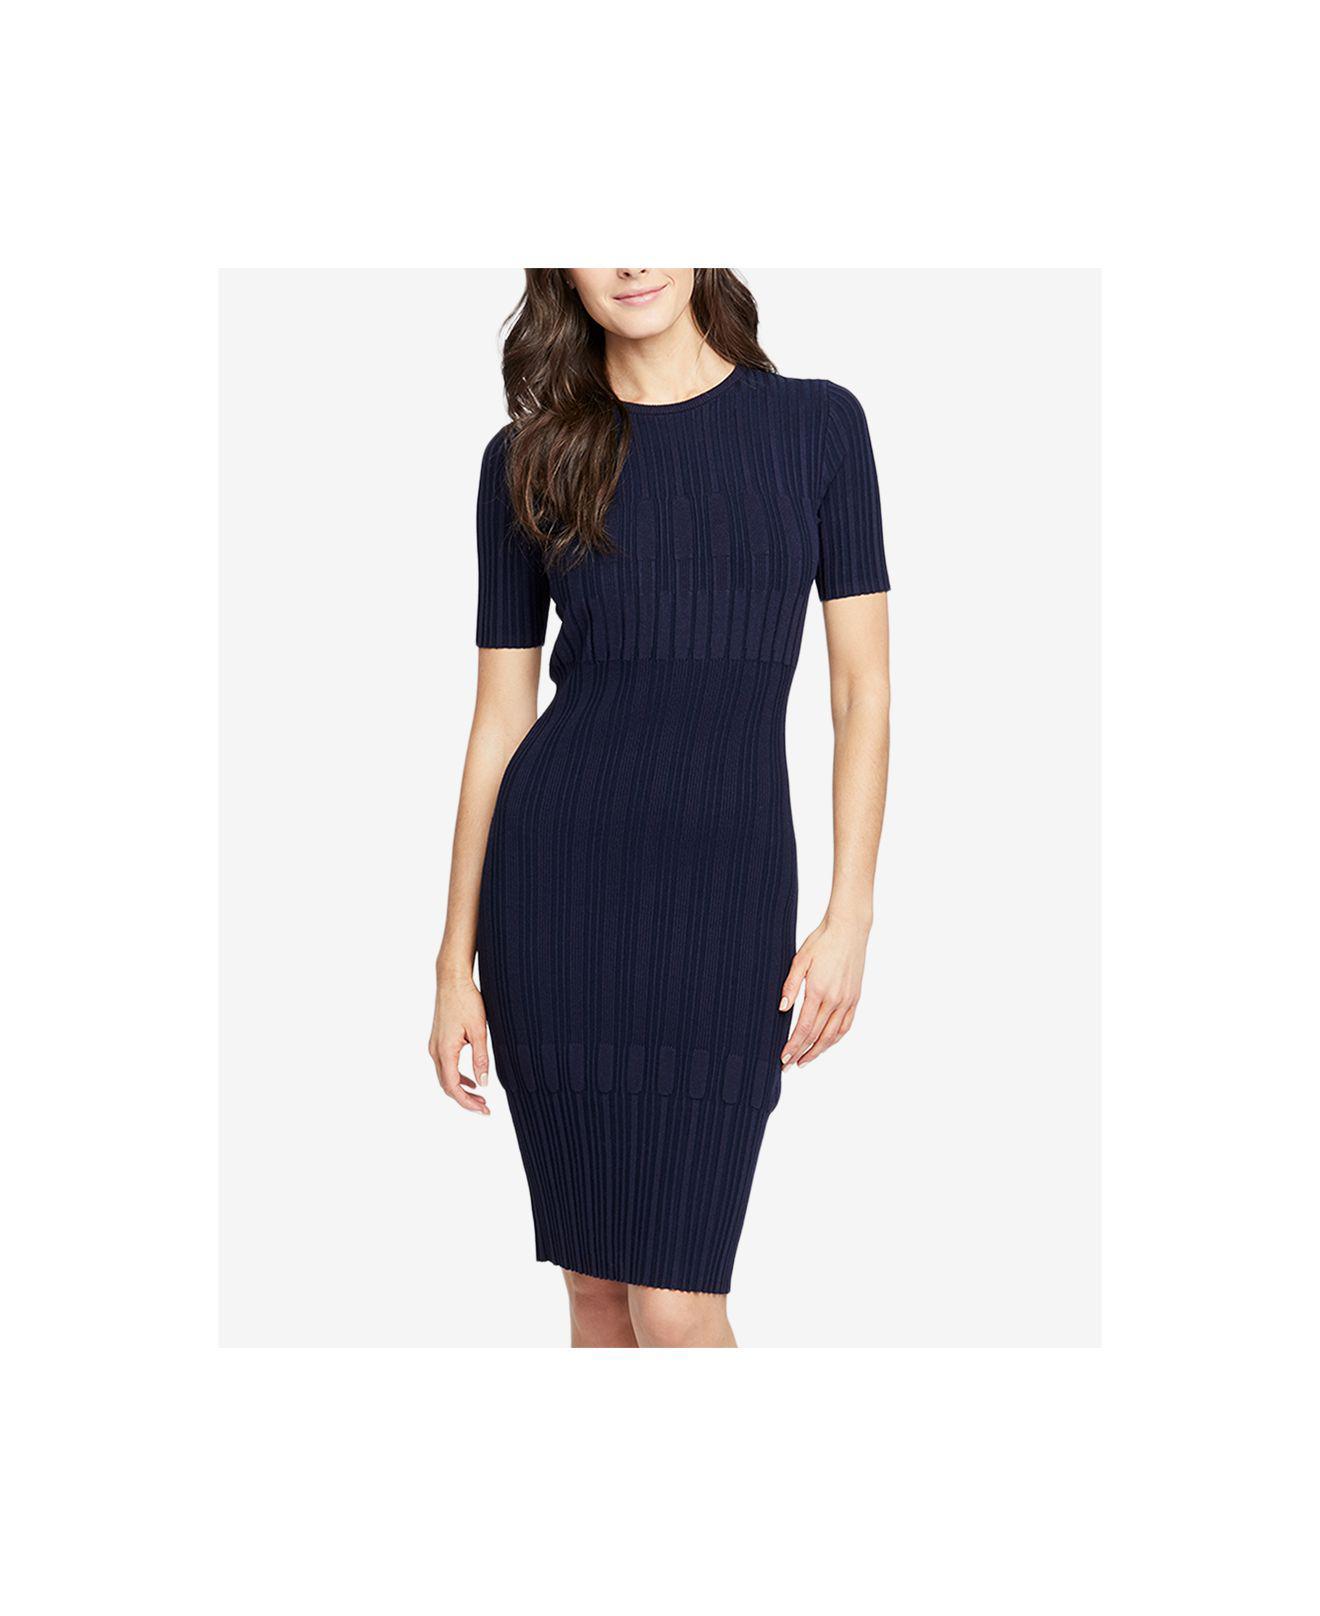 5b5a7afd69a Lyst - RACHEL Rachel Roy Sweater Dress